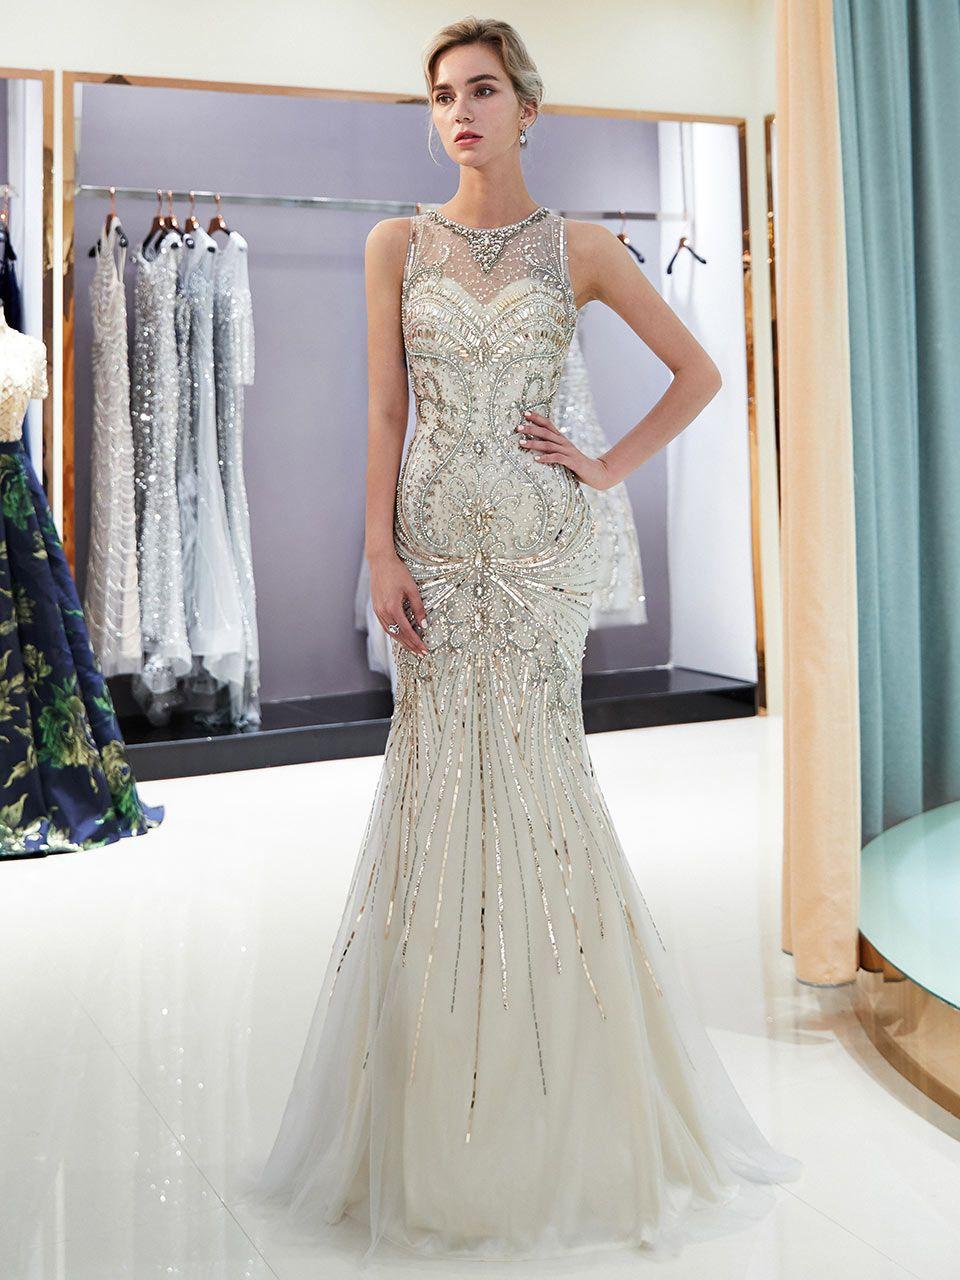 Grey mermaid wedding dress  mermaid prom dressesbeaded prom dressesgrey prom dressesmermaid